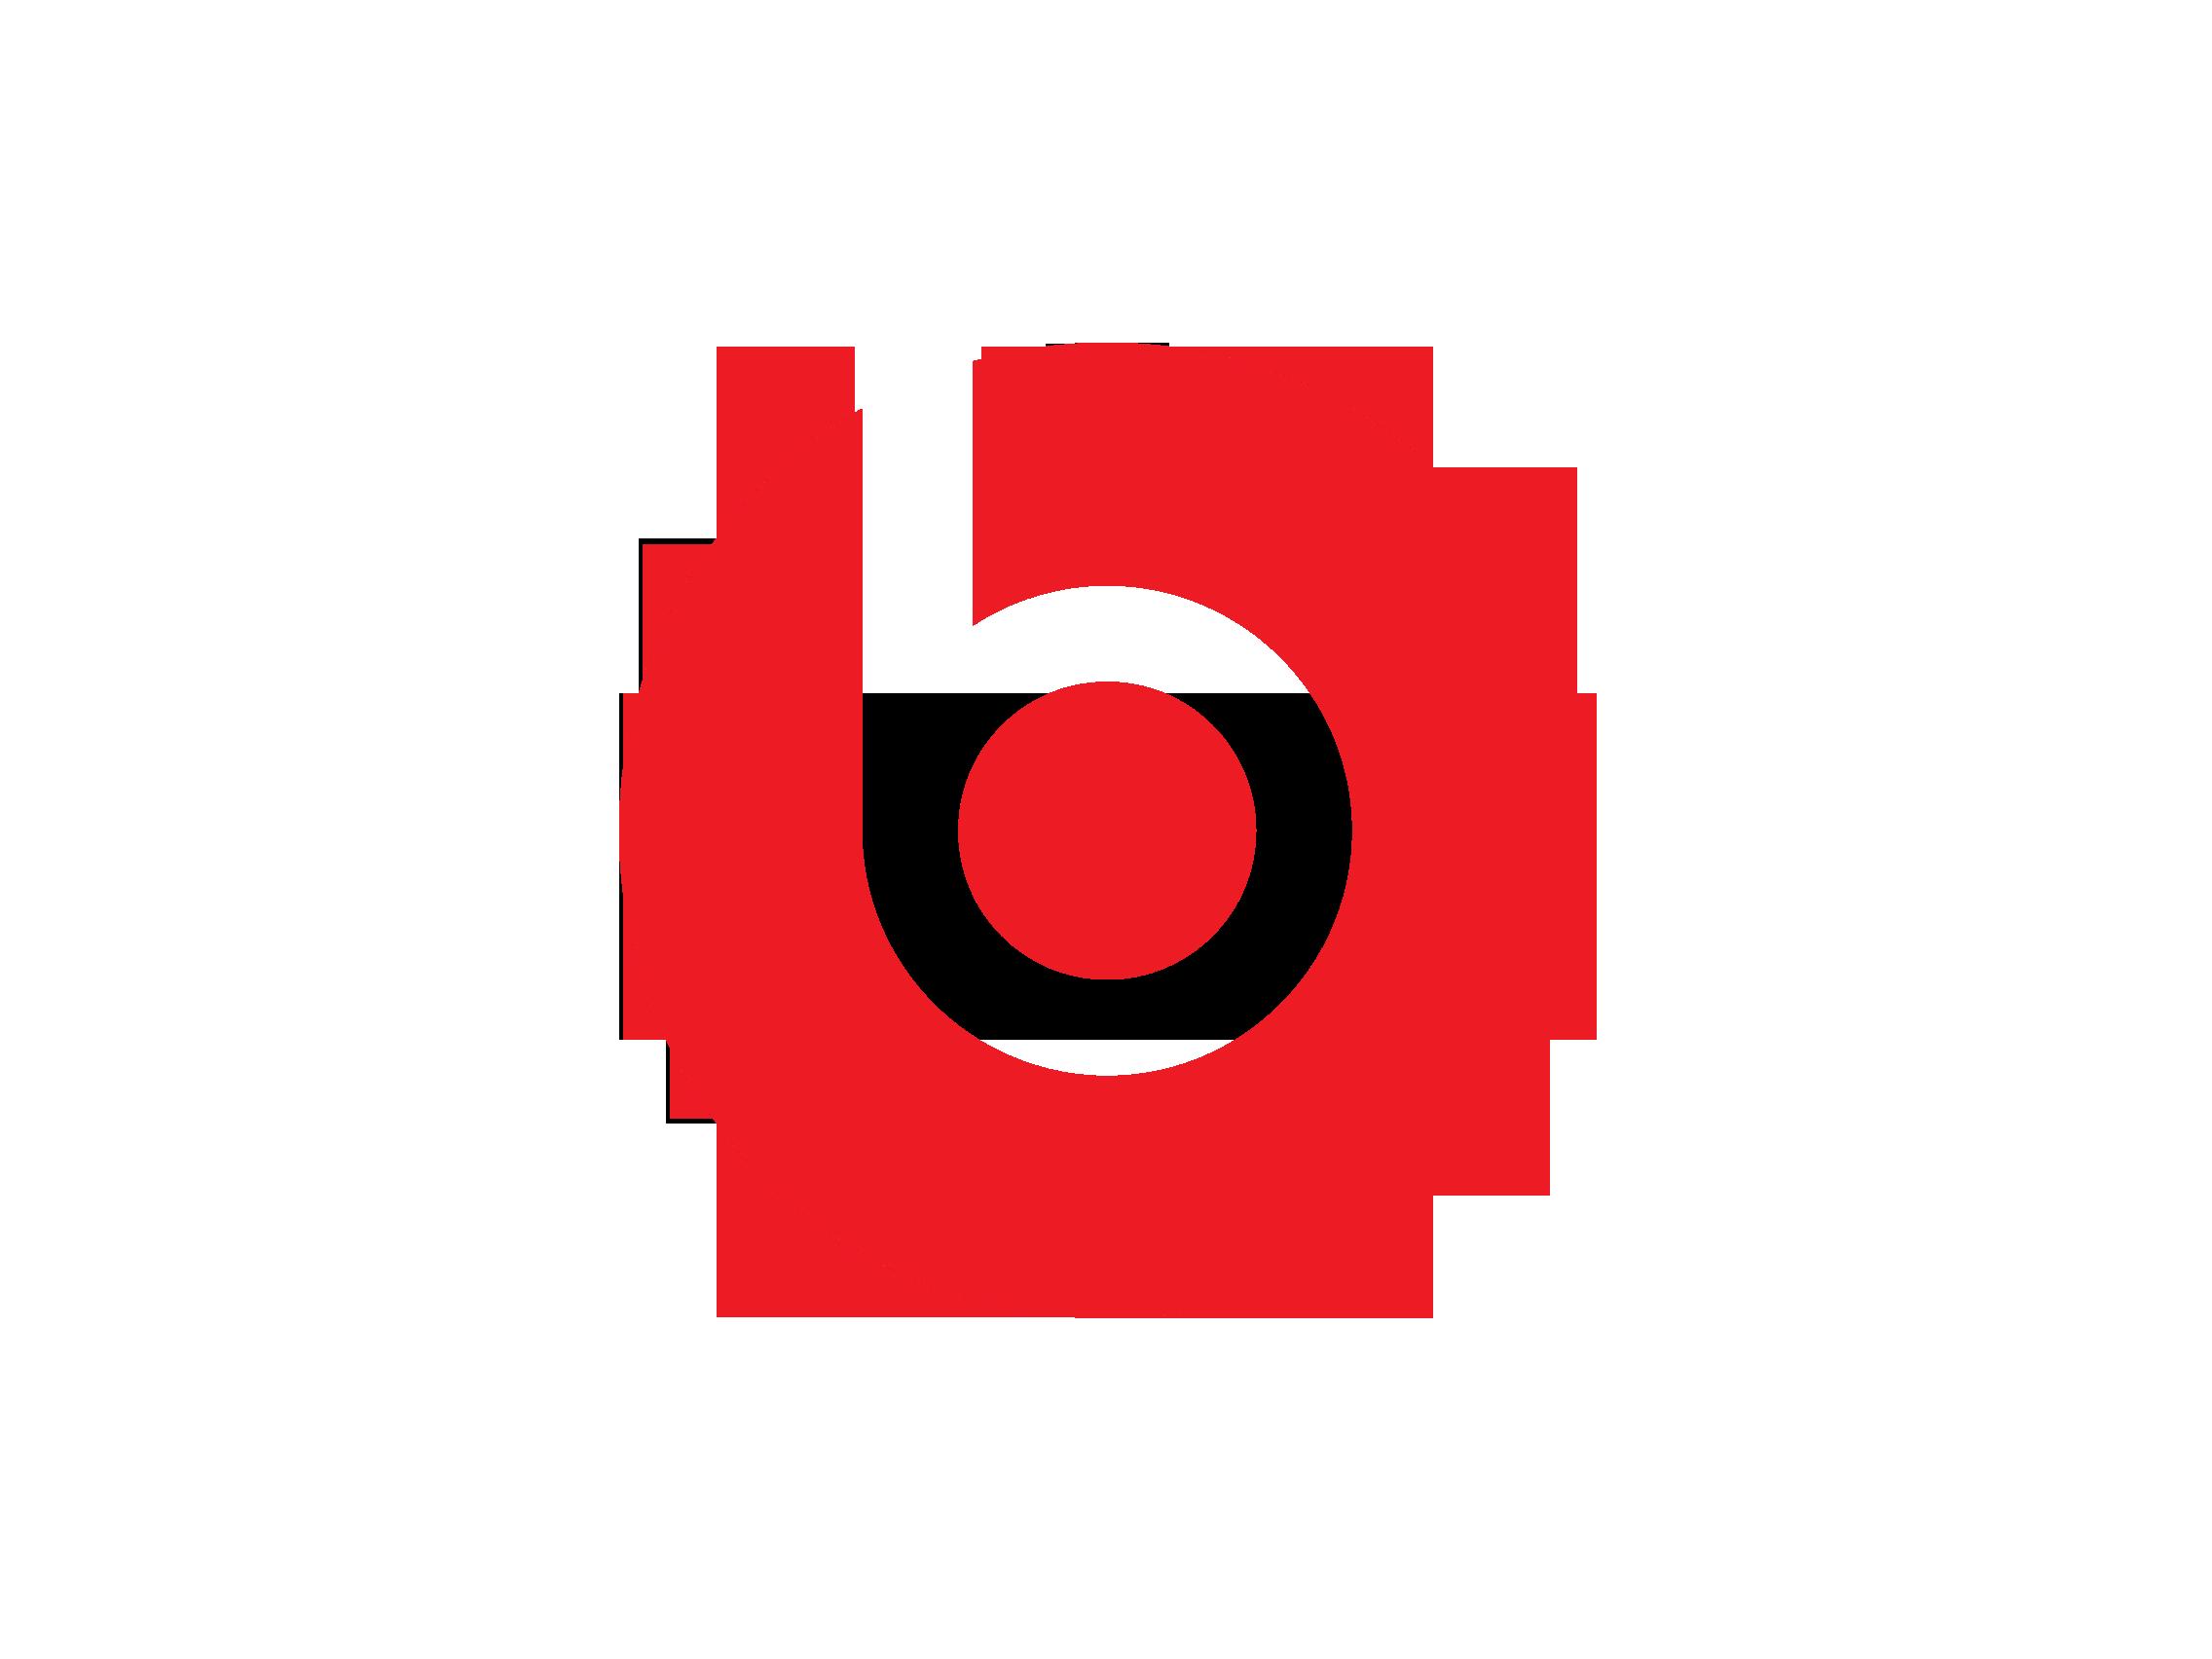 Beats Electronics is a American audio company co.